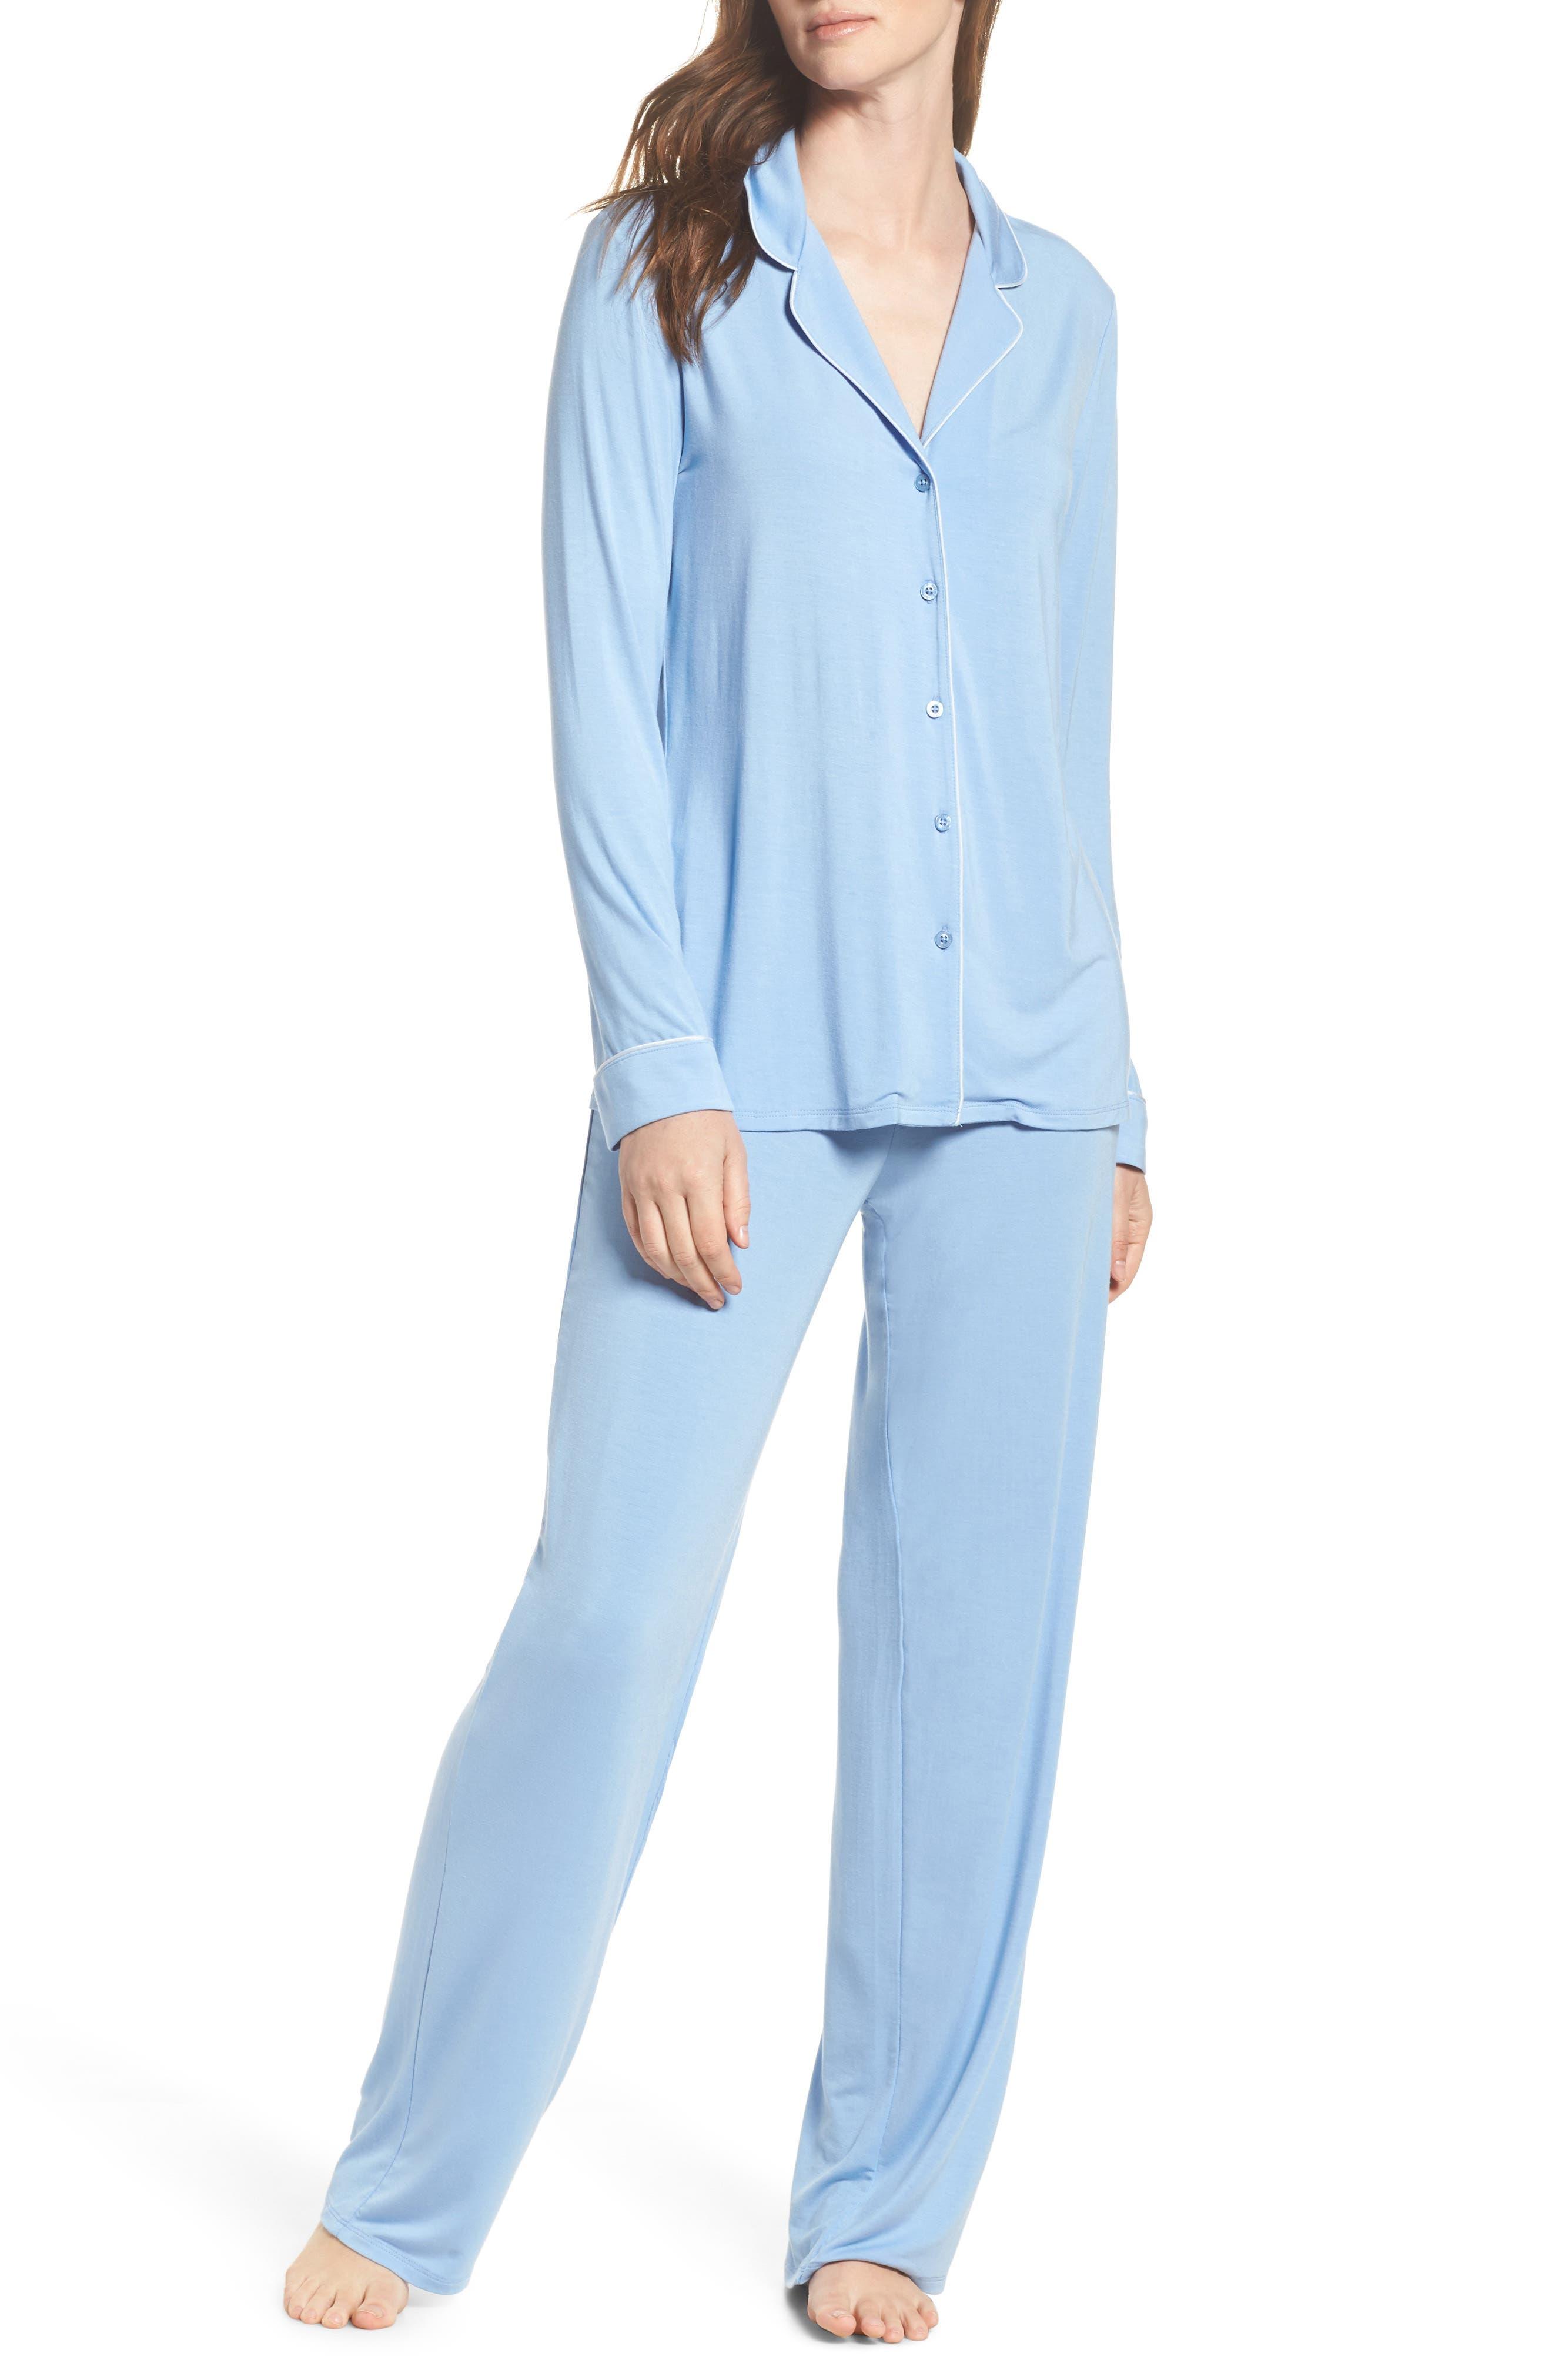 Alternate Image 1 Selected - Nordstrom Lingerie Moonlight Pajamas